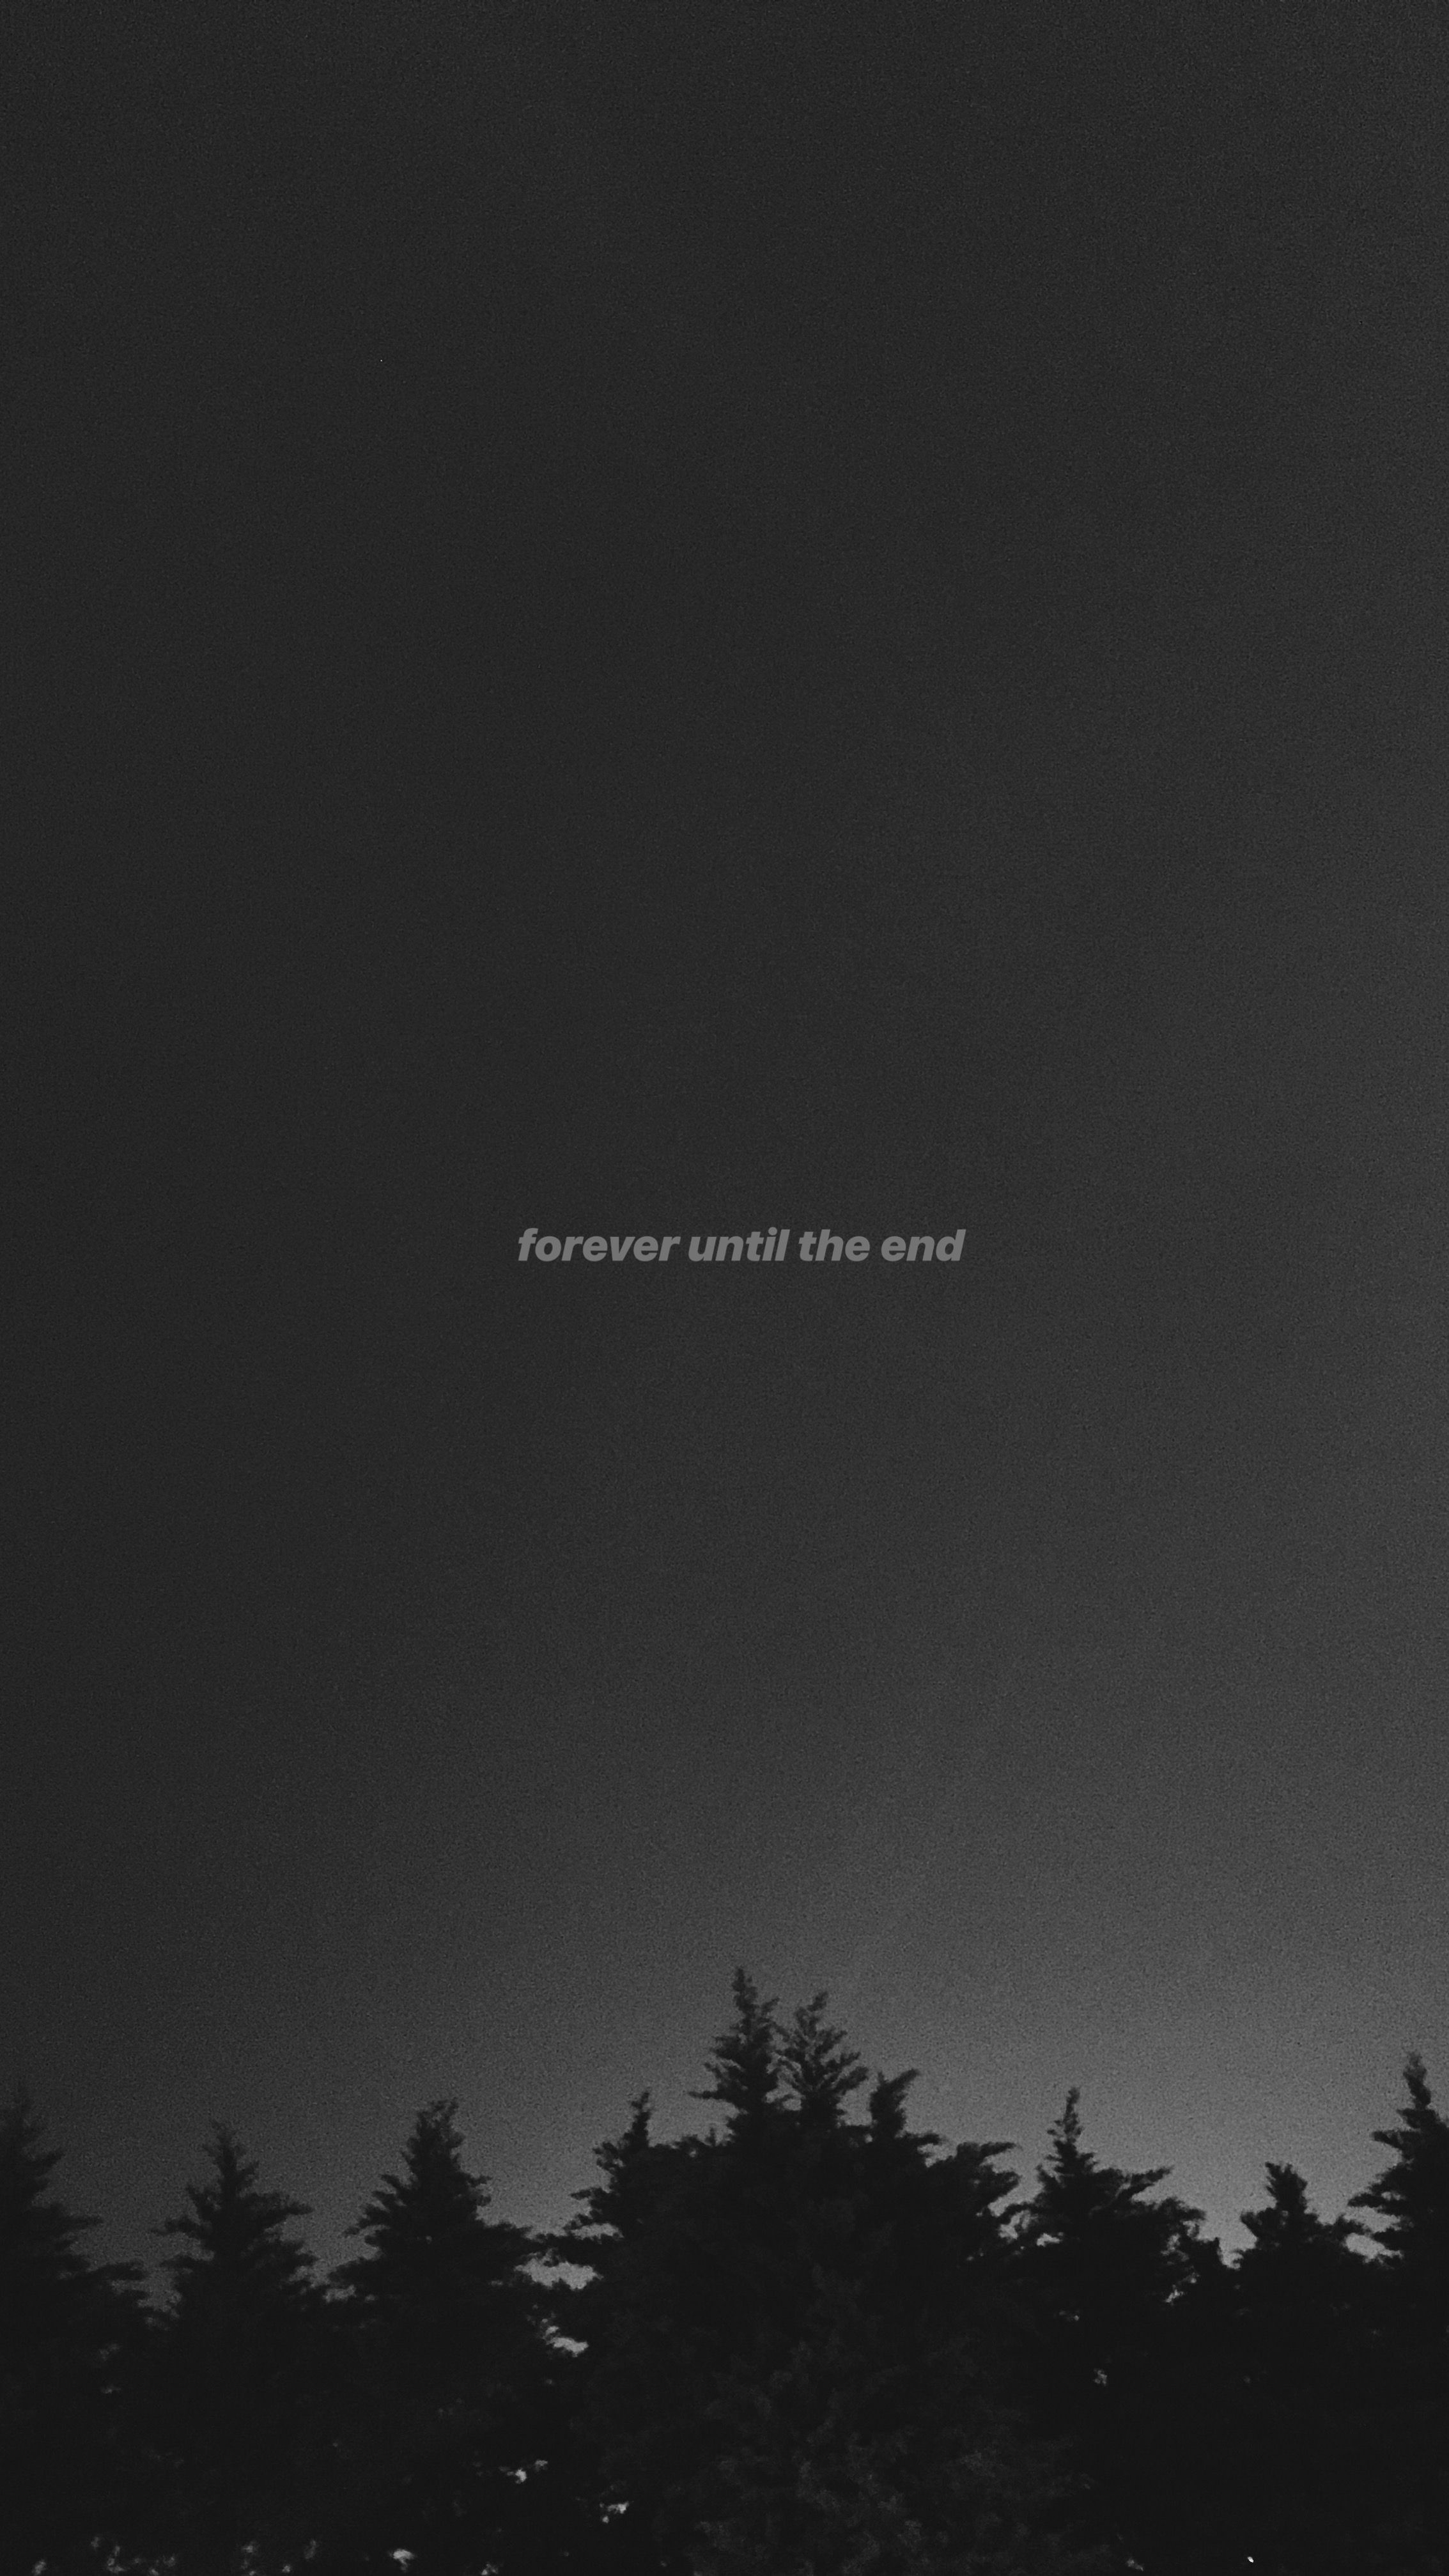 Forever until the end. للأبد حتی النهاية . Wallpaper